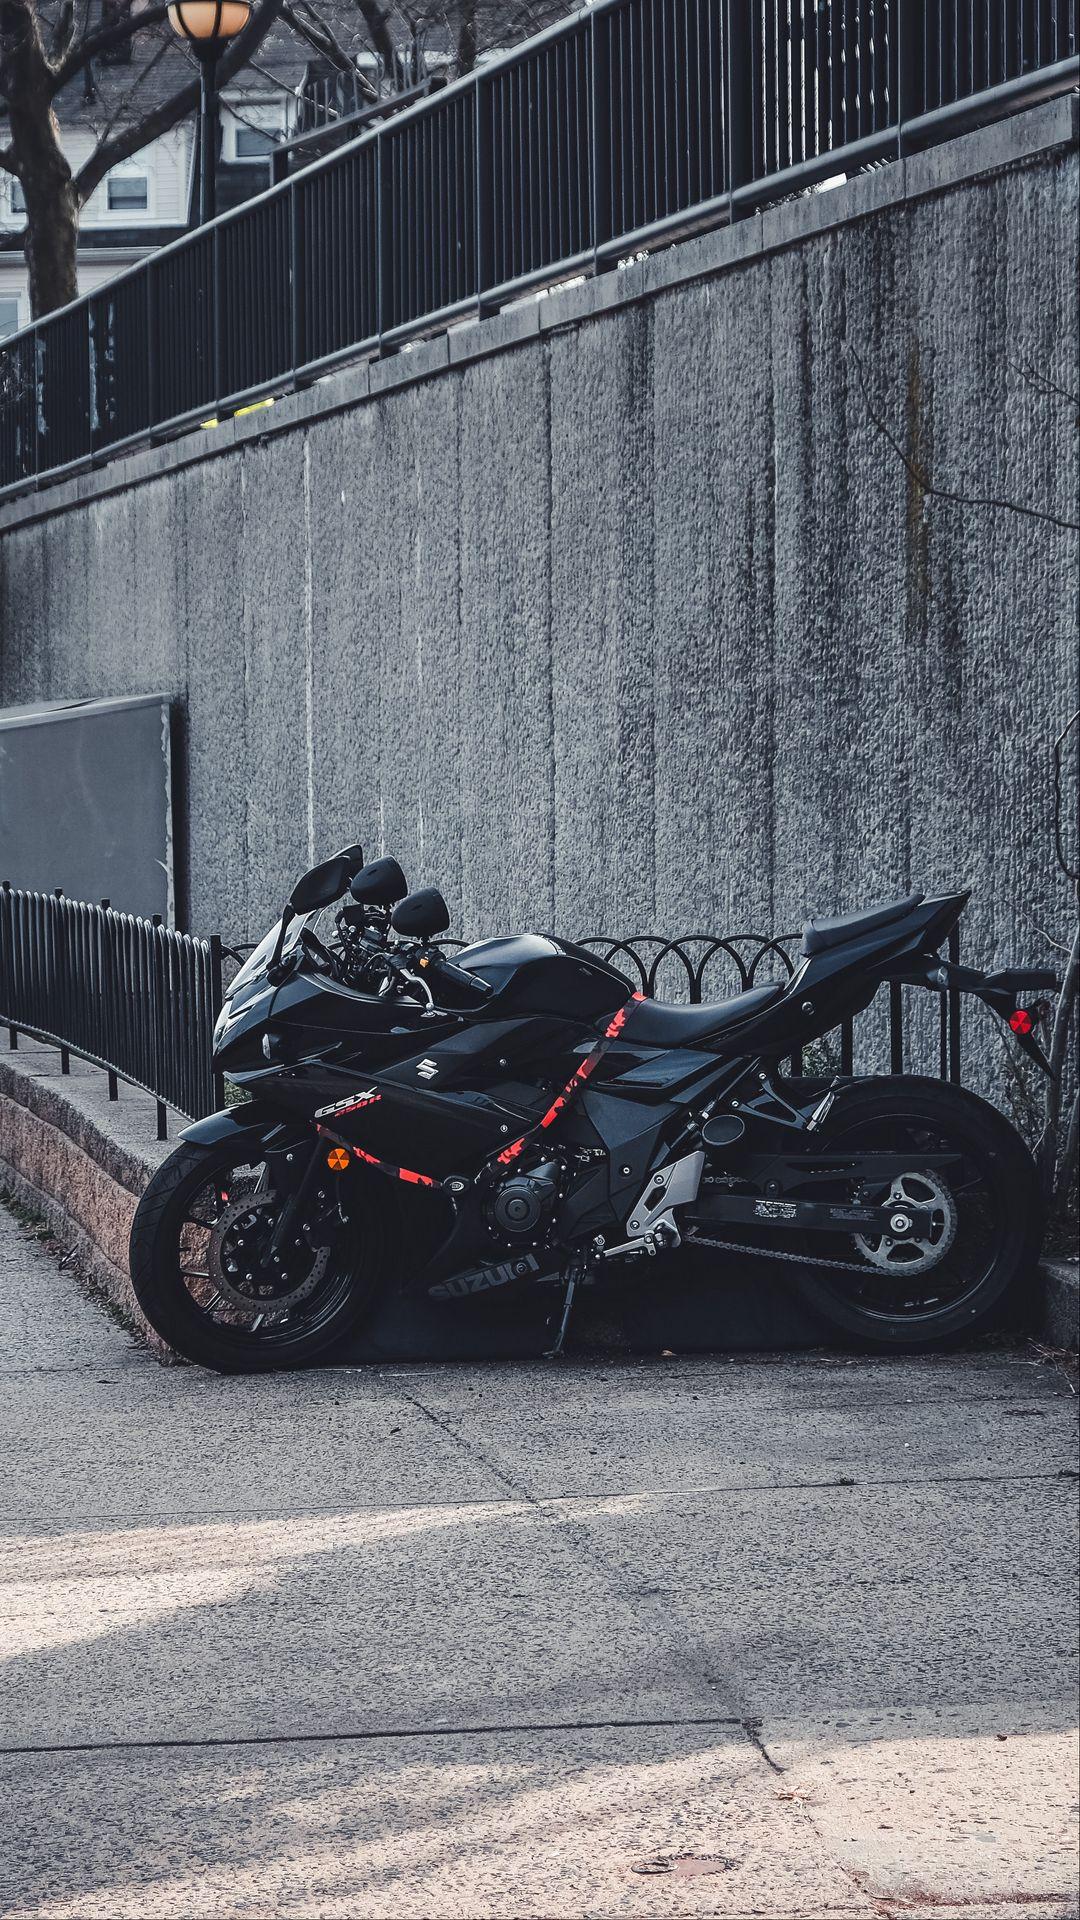 1080x1920 Wallpaper suzuki, motorcycle, bike, black, parking